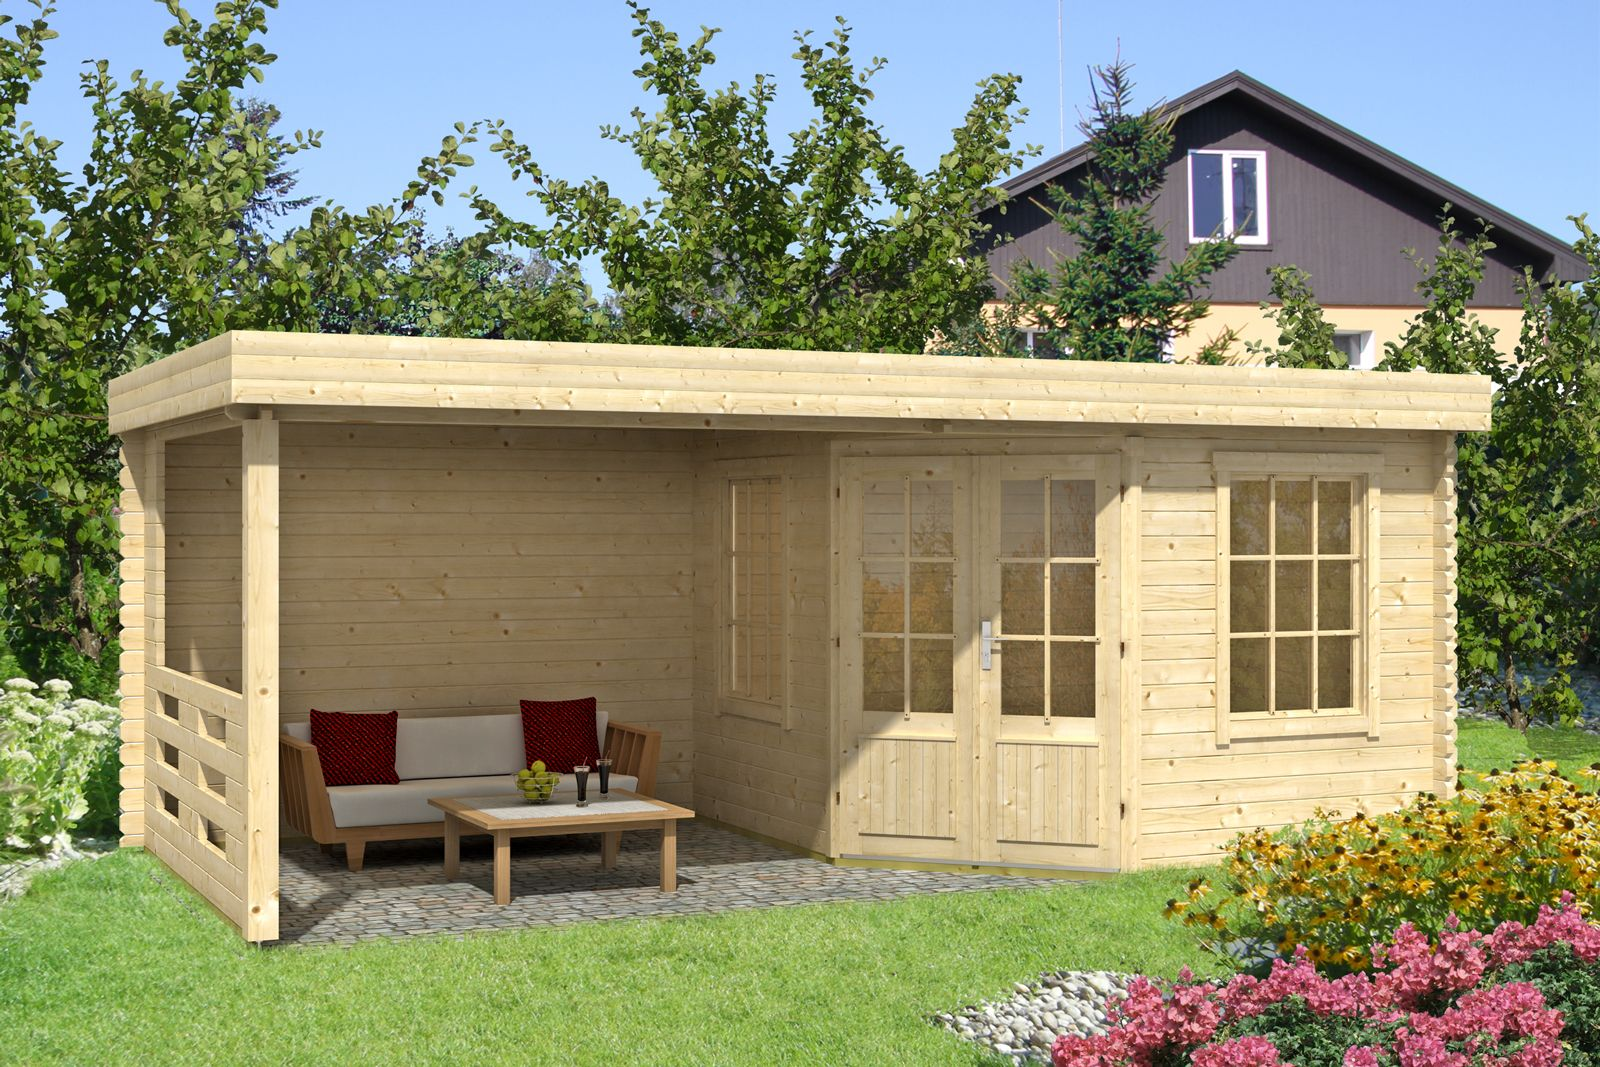 Vorschau: Gartenhaus Modell